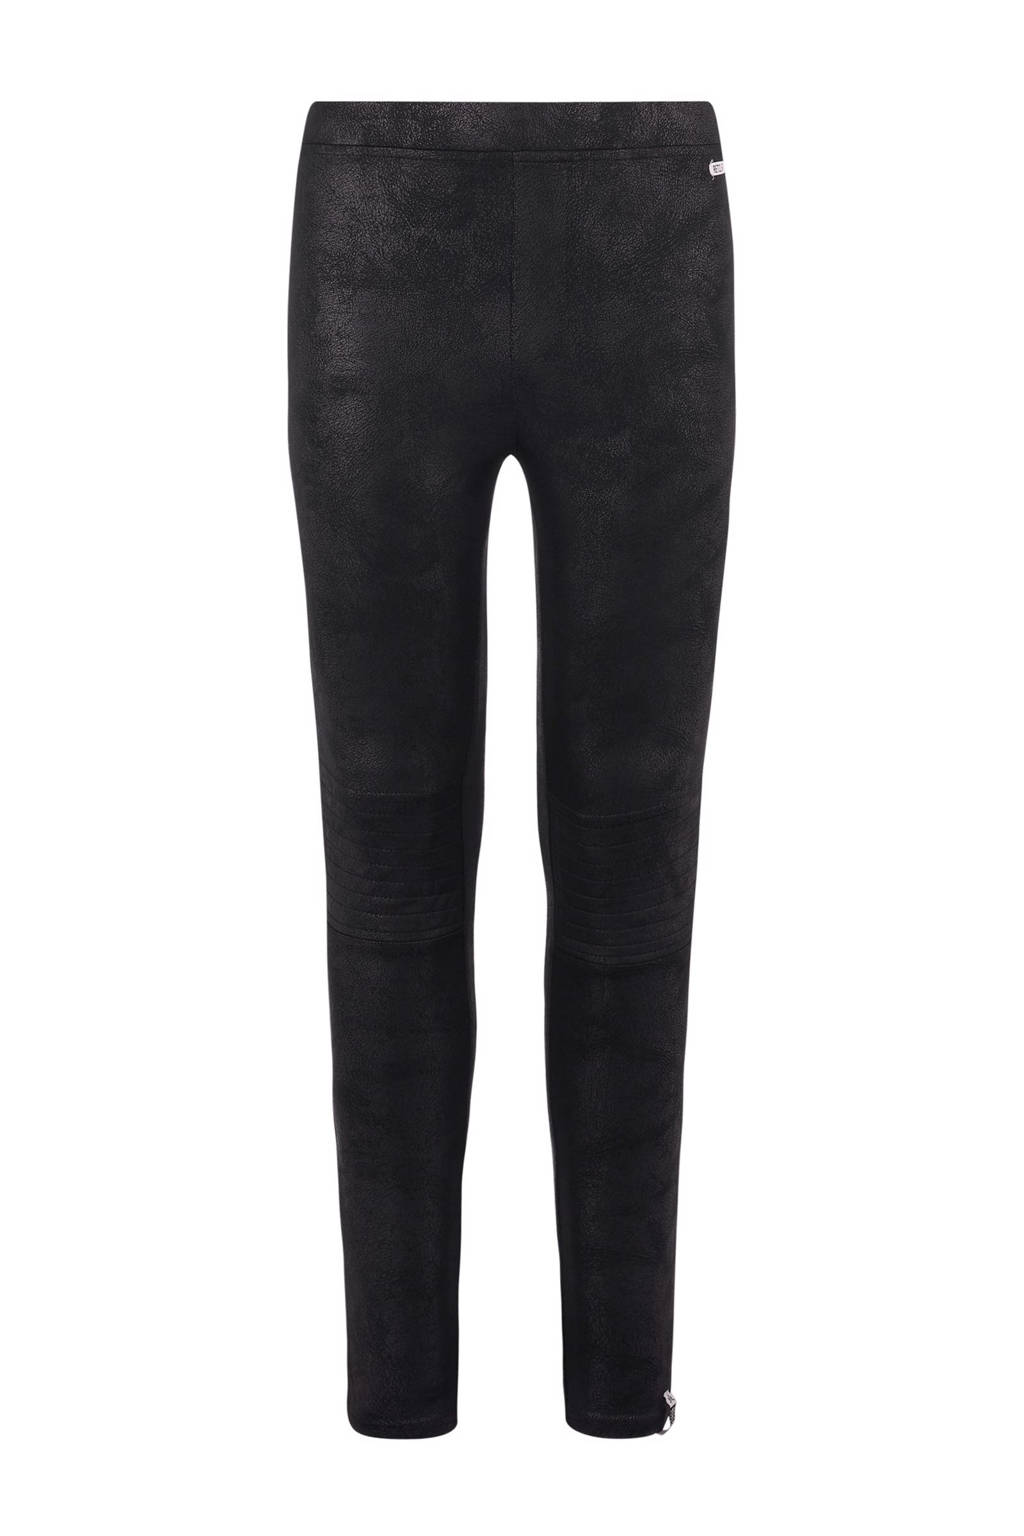 Retour Denim coated legging Karli zwart, Zwart